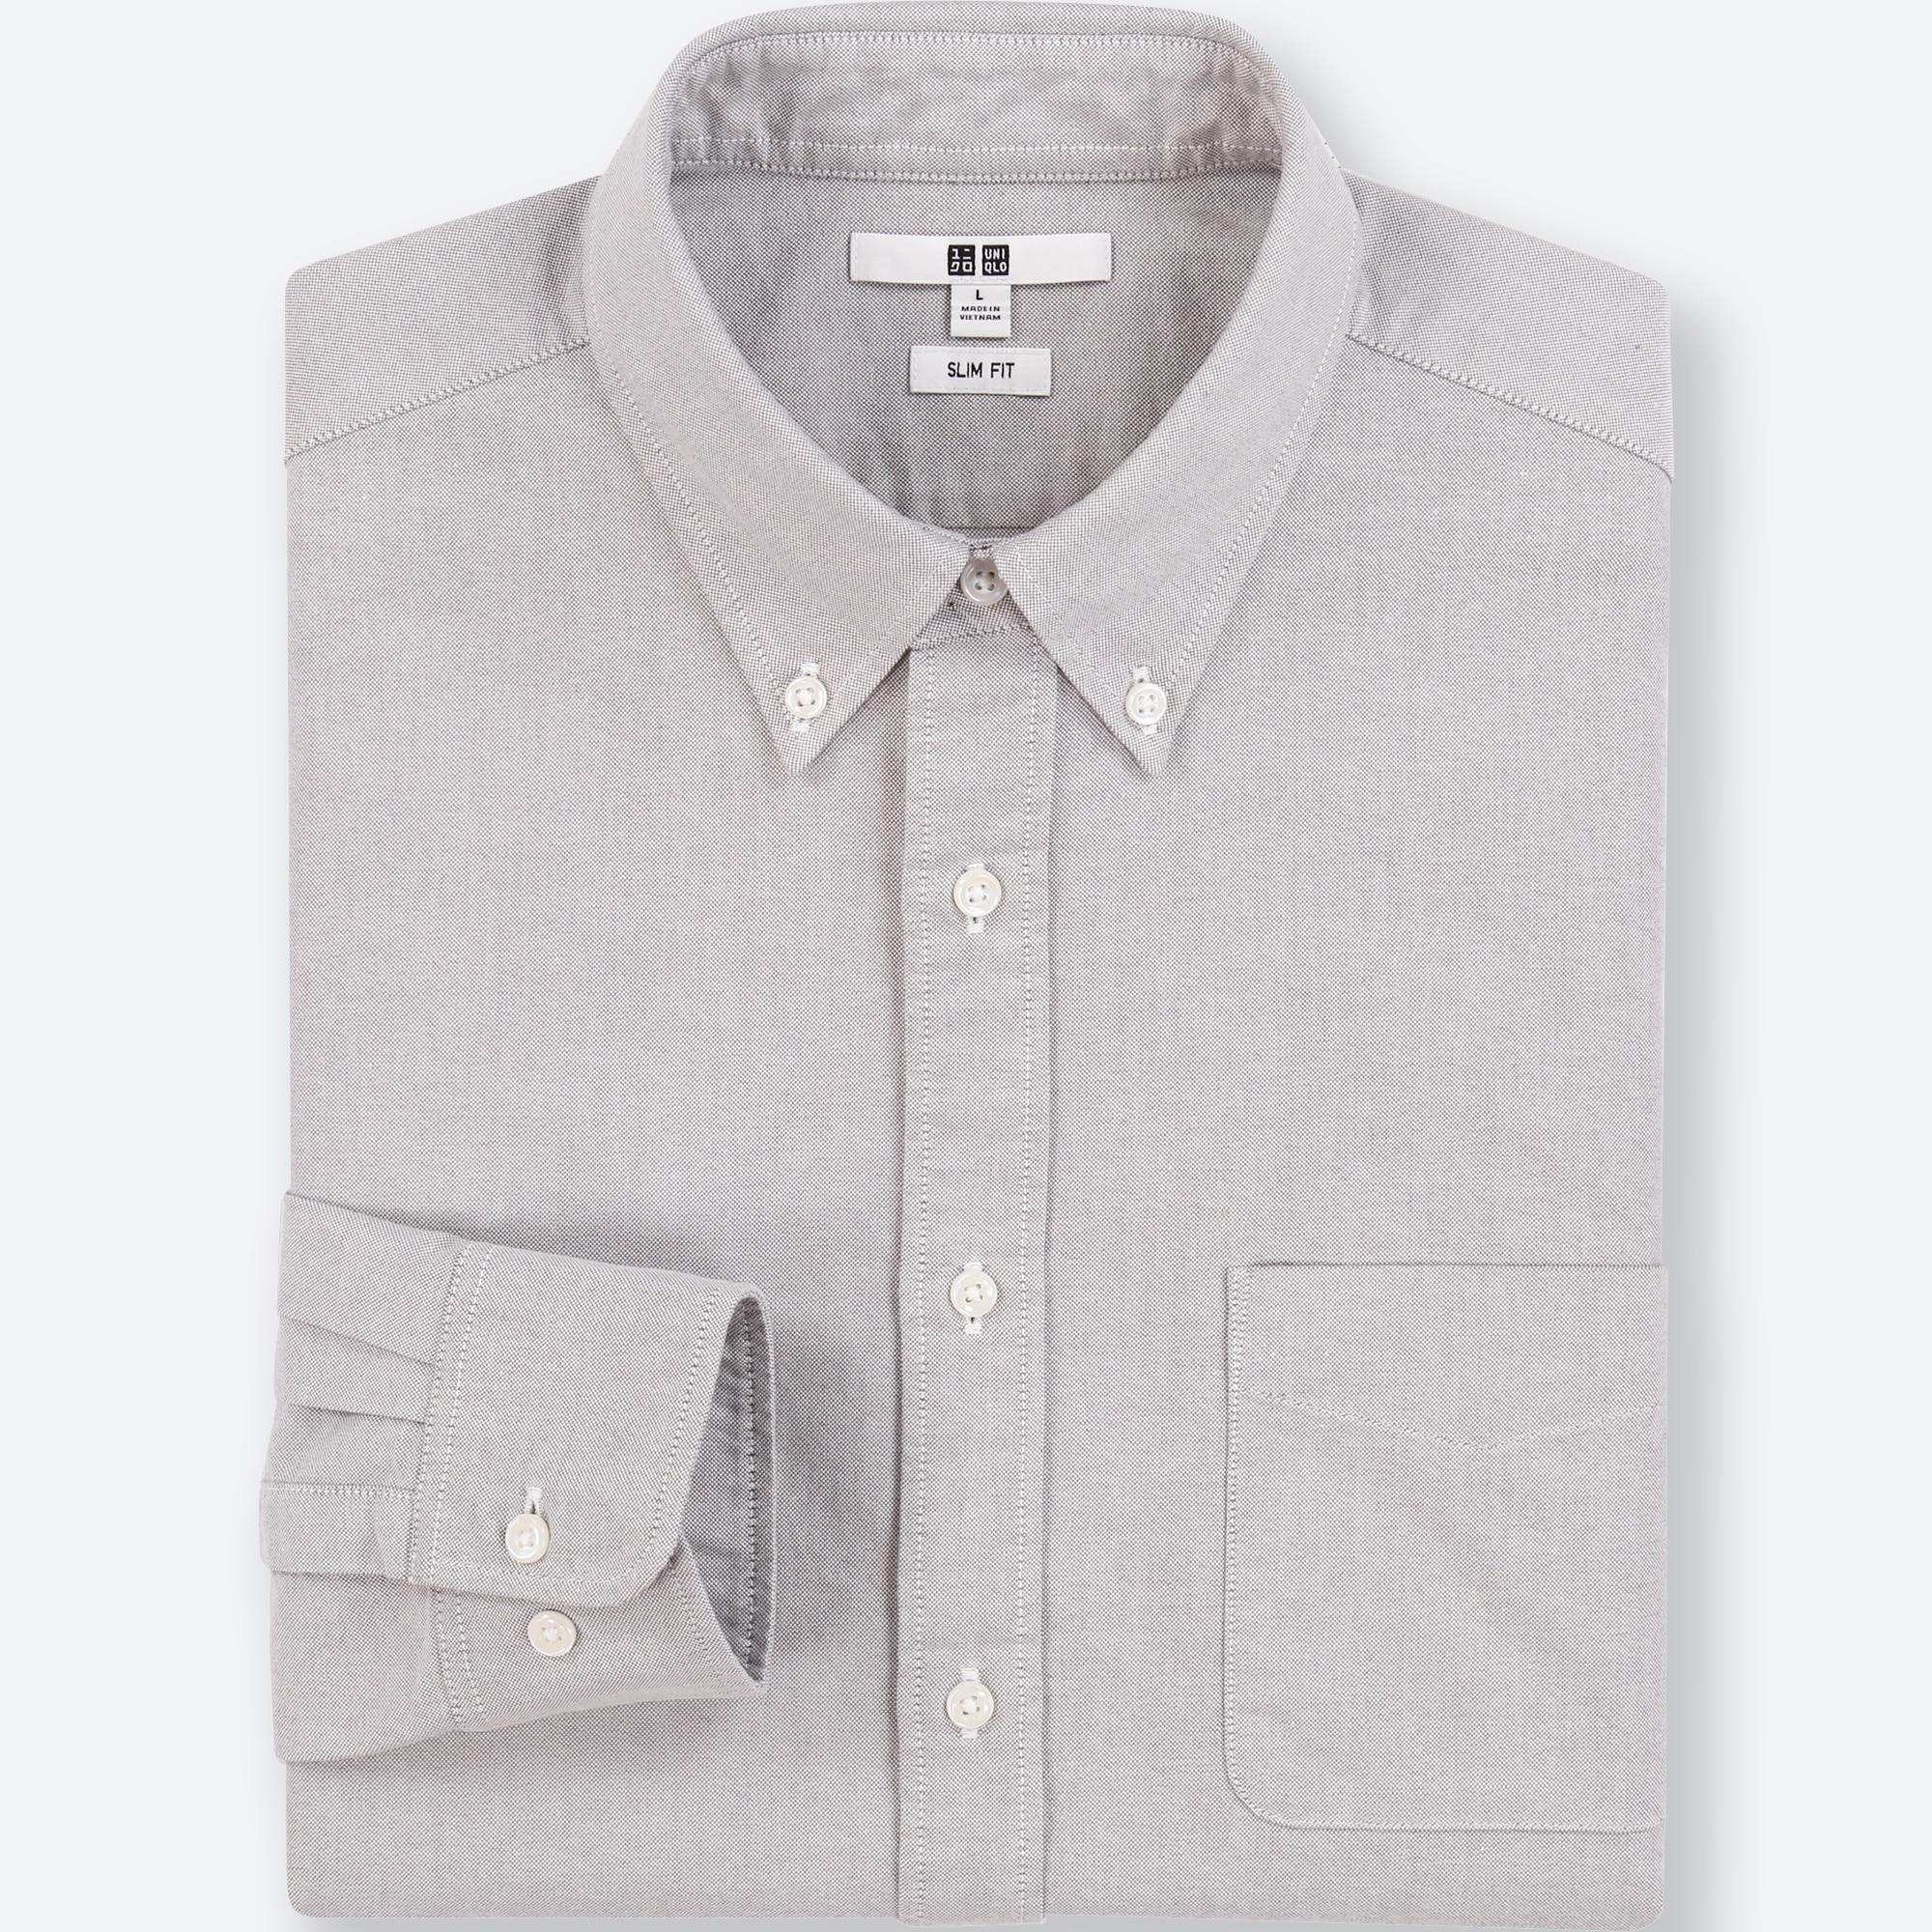 Uniqlo Shirt Blue XL Slim Fit Oxford